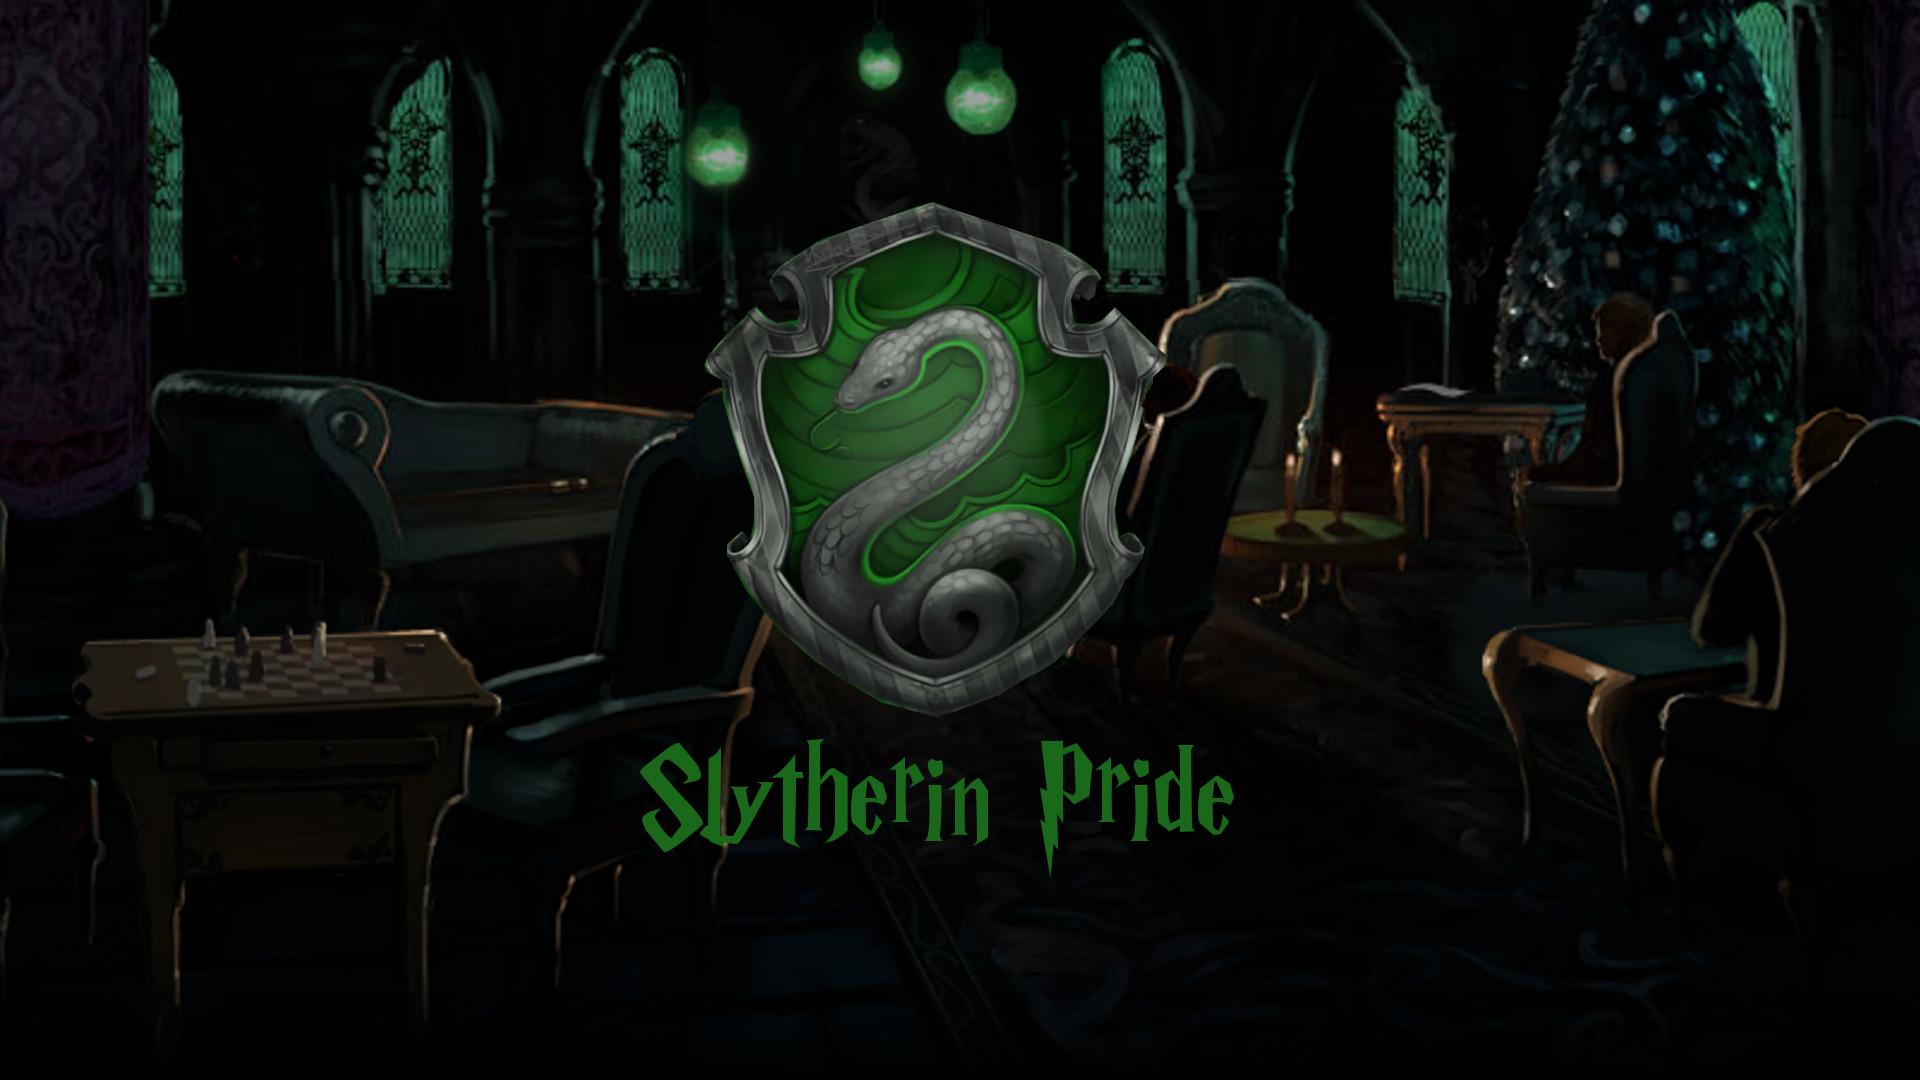 56 Slytherin Crest